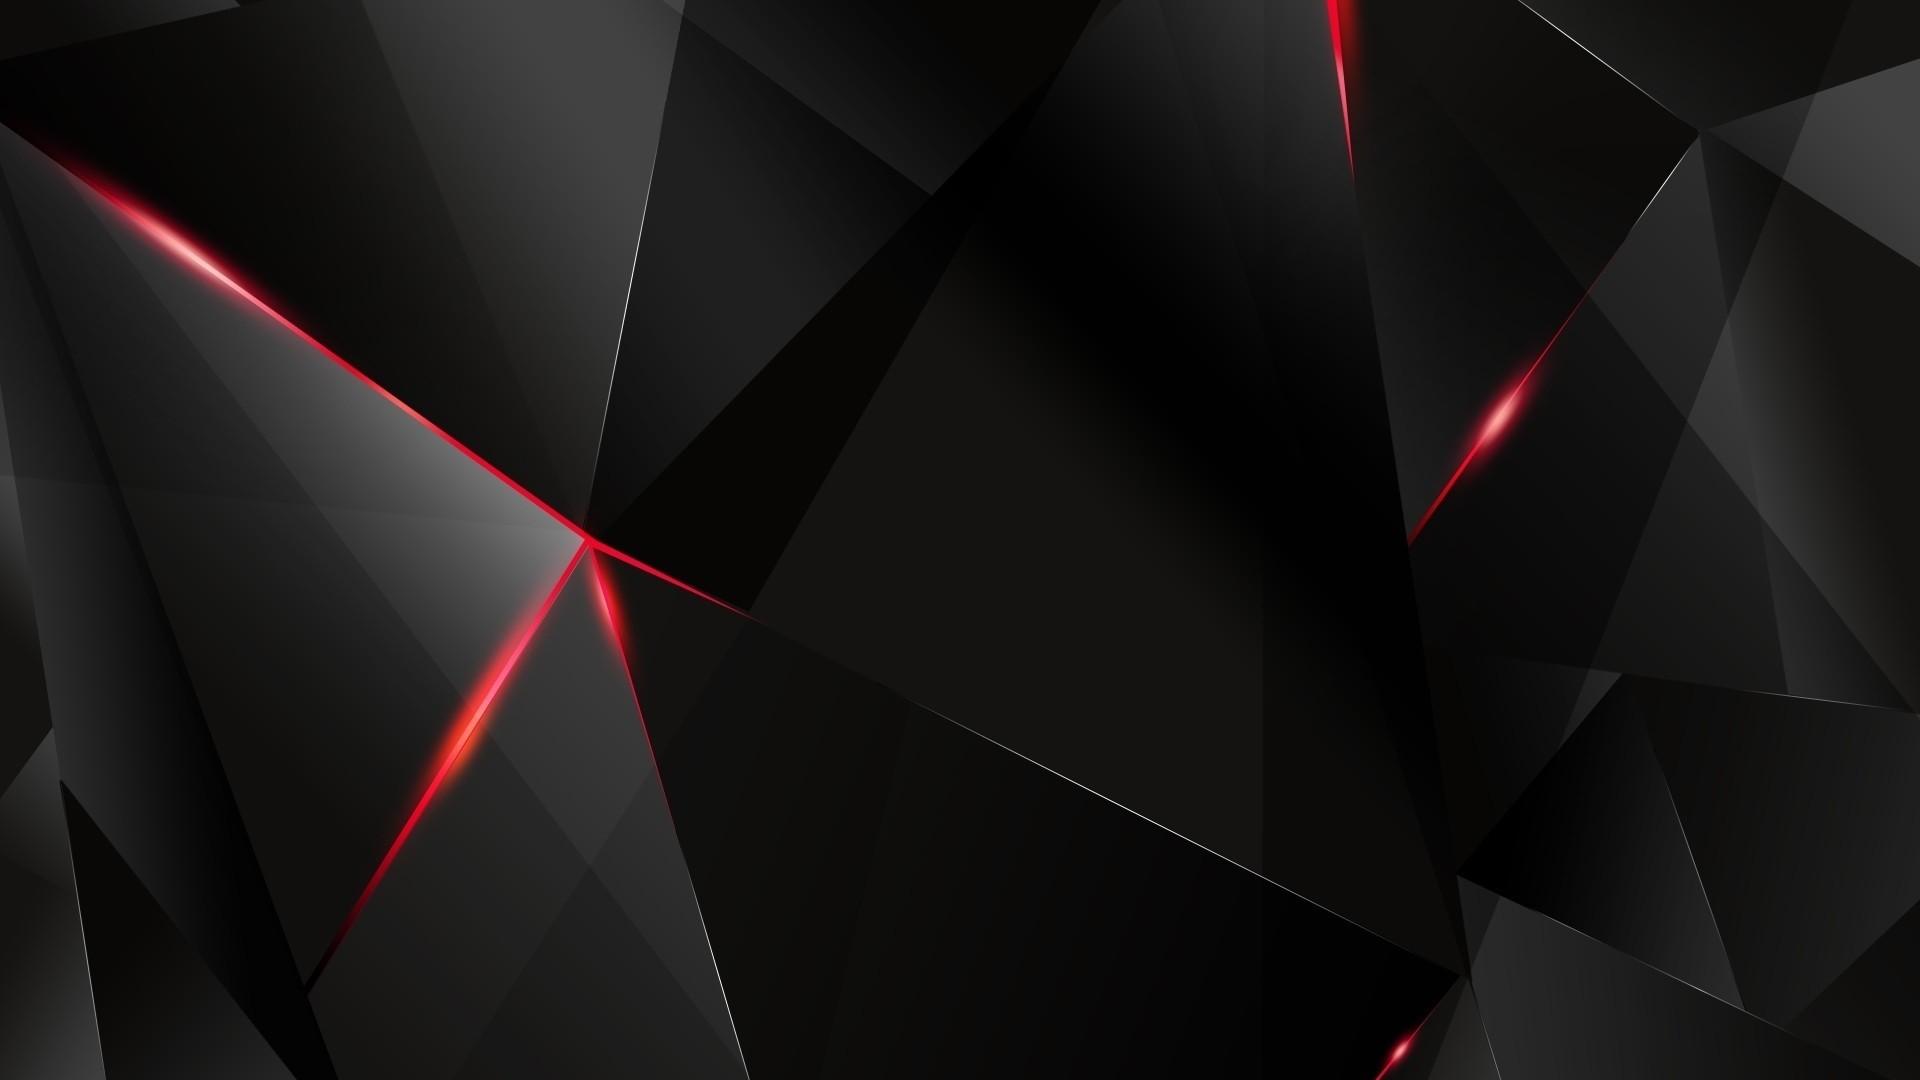 hinh nen desktop 13